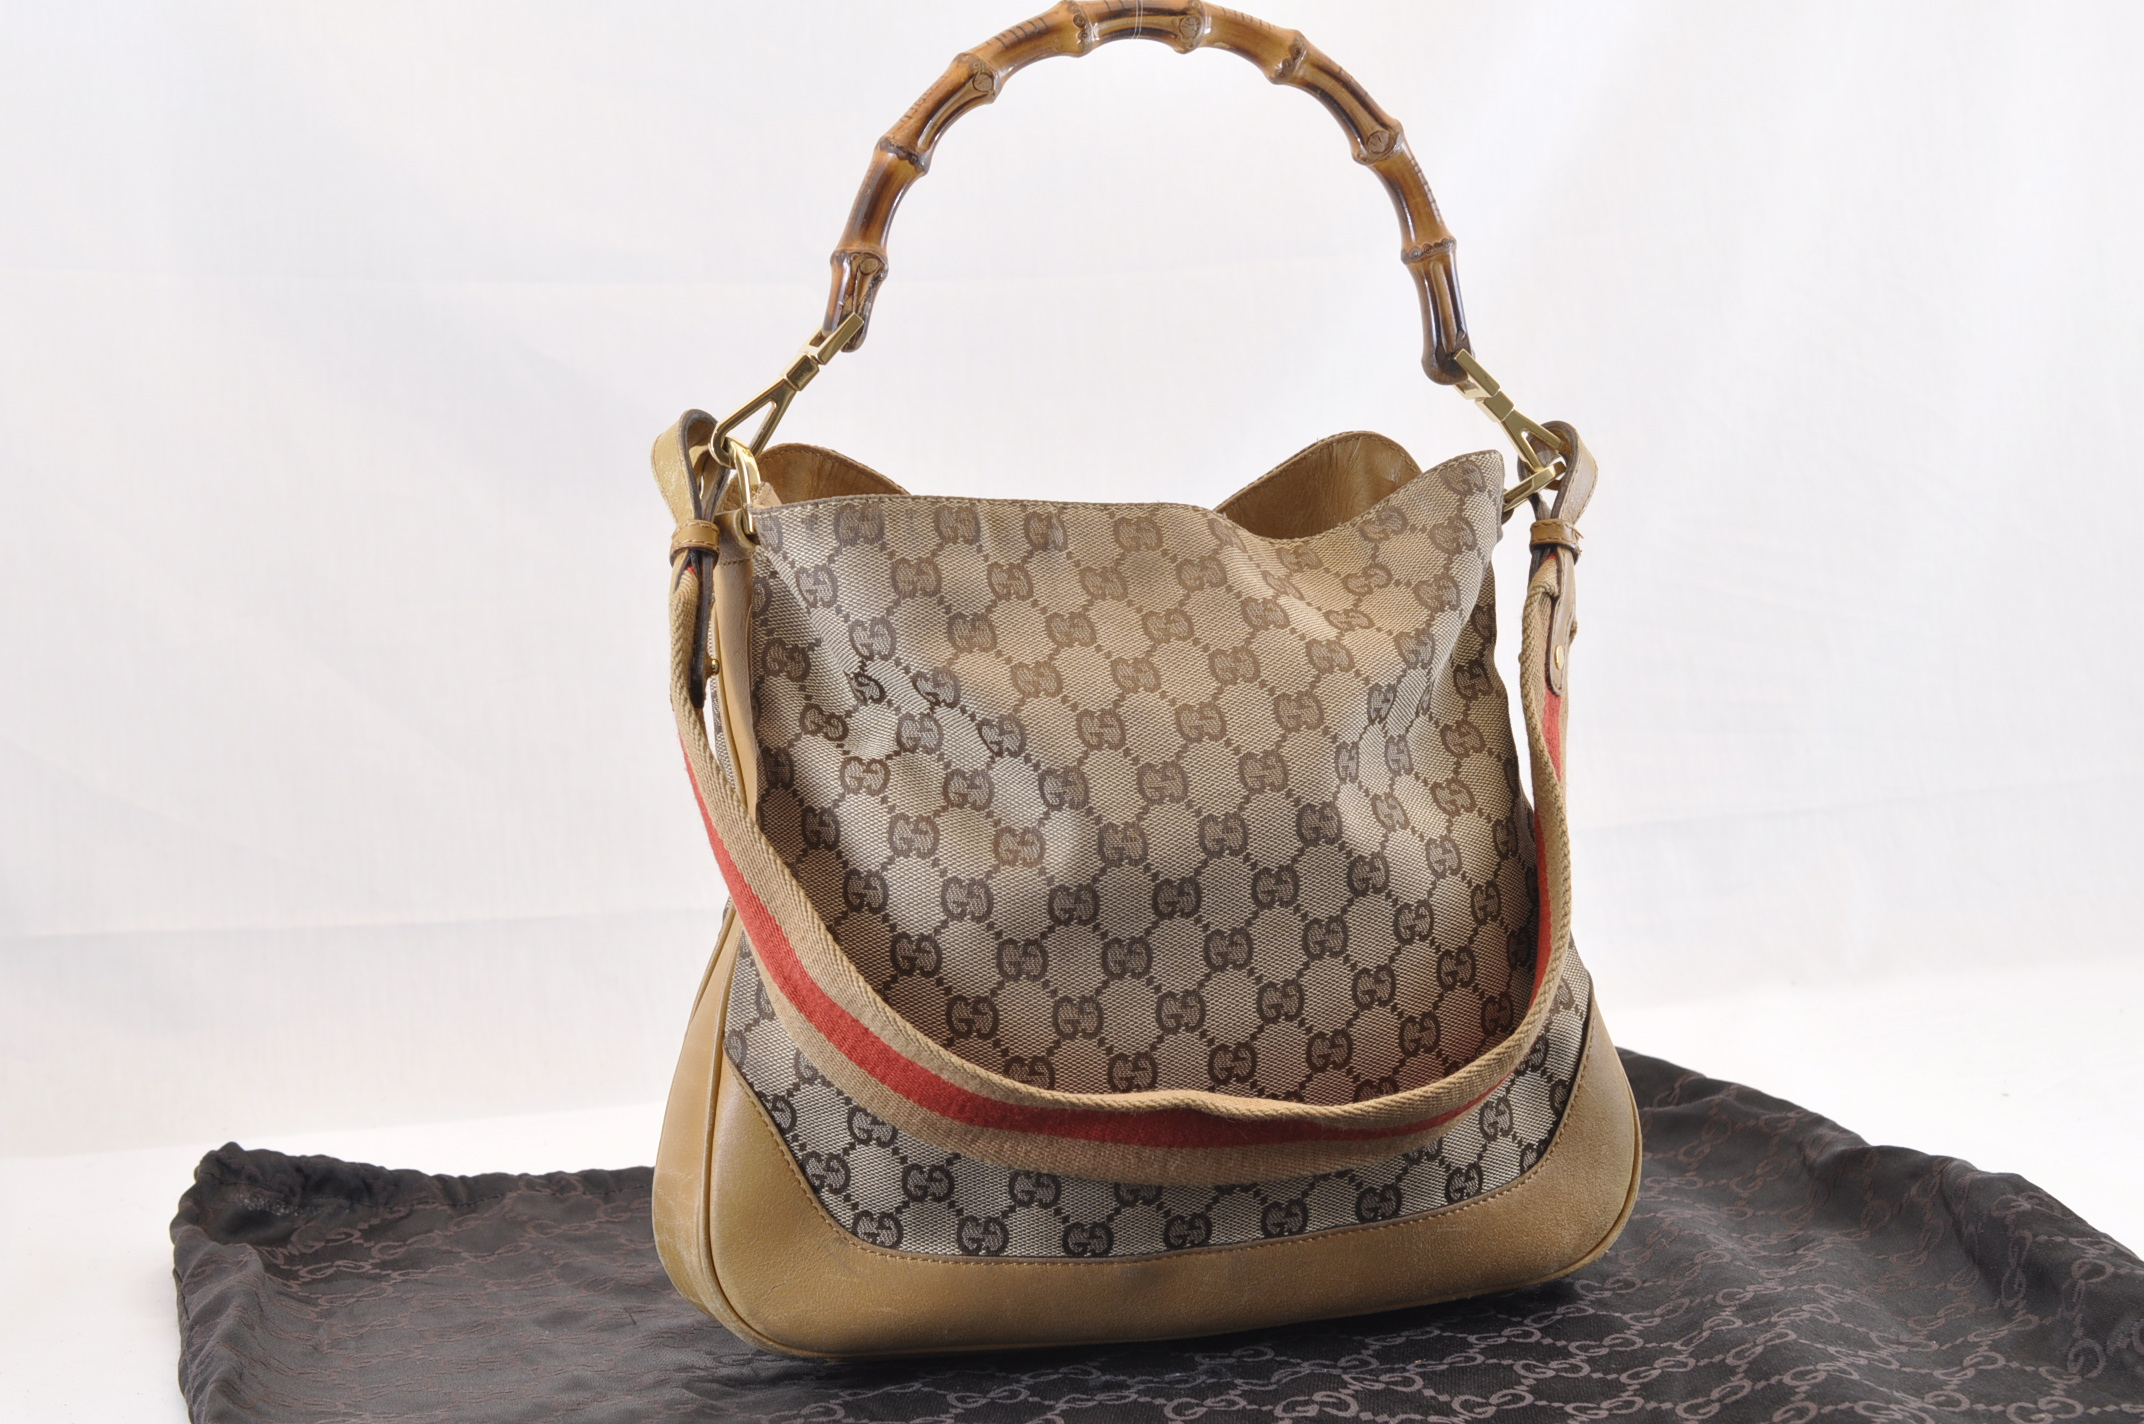 cc14df72c90 GUCCI Bamboo Sherry Line GG Canvas 2 Way Hand Bag Light Brown Auth 6926.  DSC0187-9.jpg ...